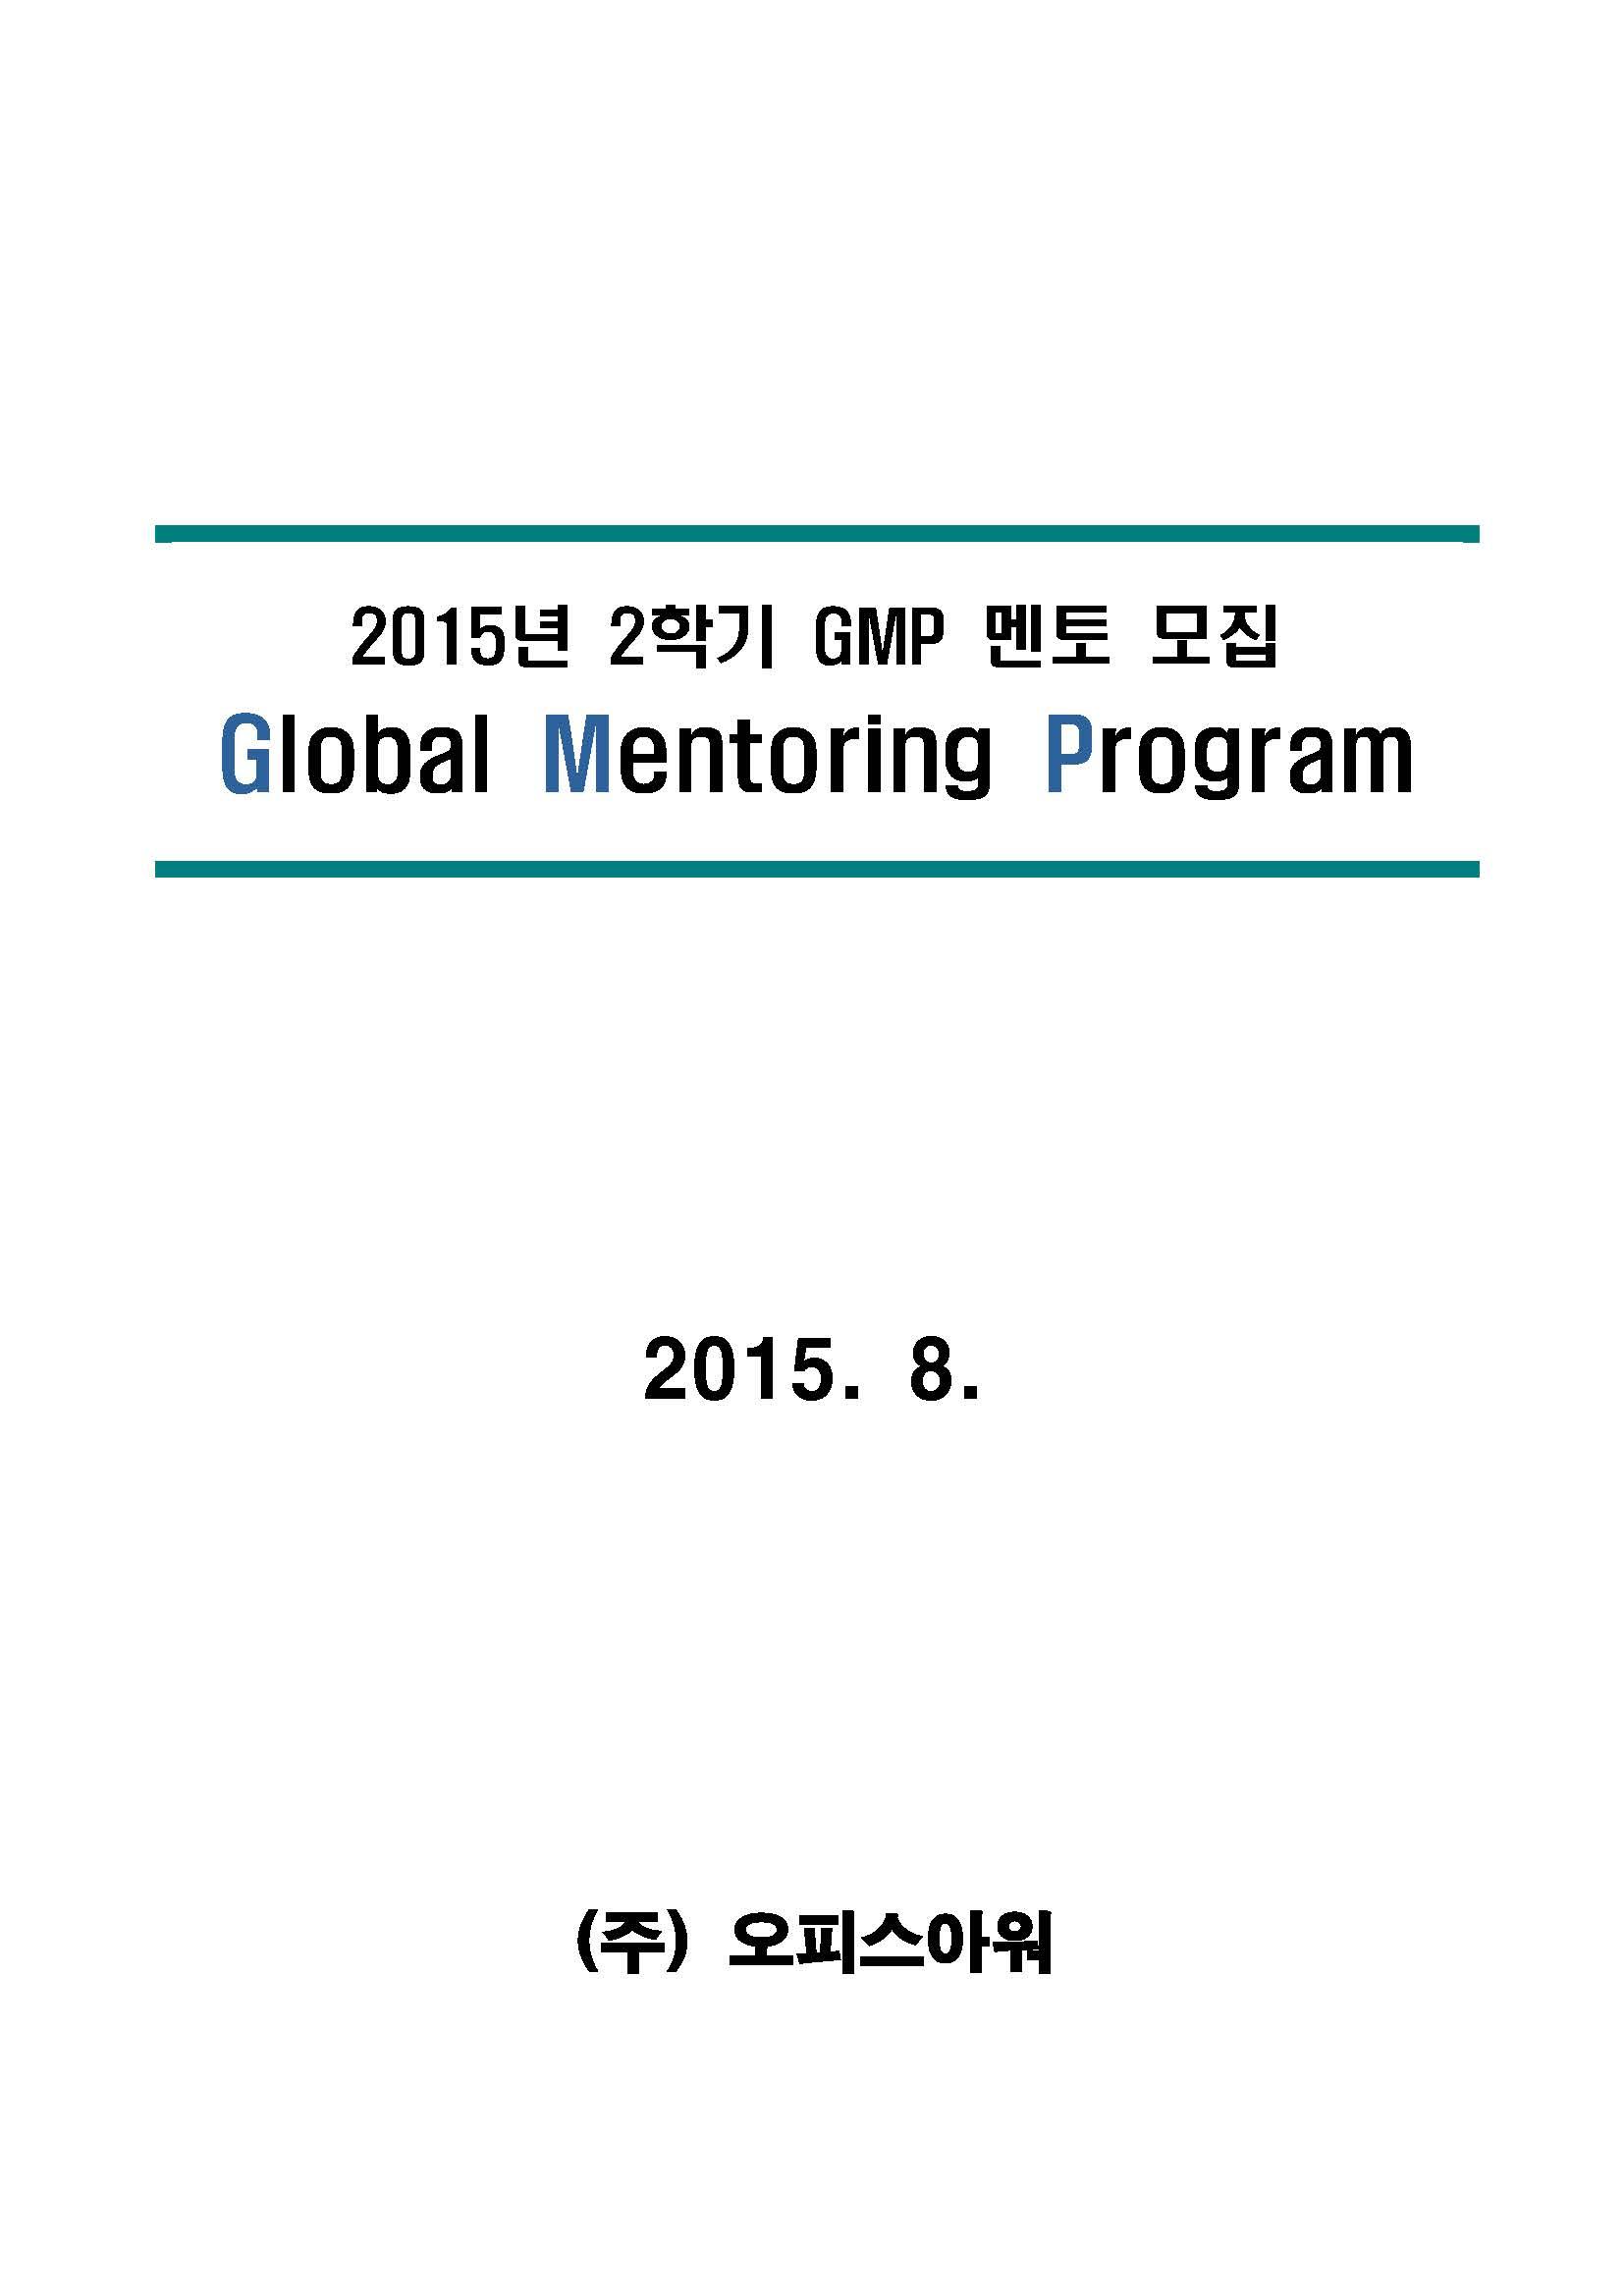 GMP 프로그램 멘토 모집 공고문_150814 (1)_페이지_1.jpg